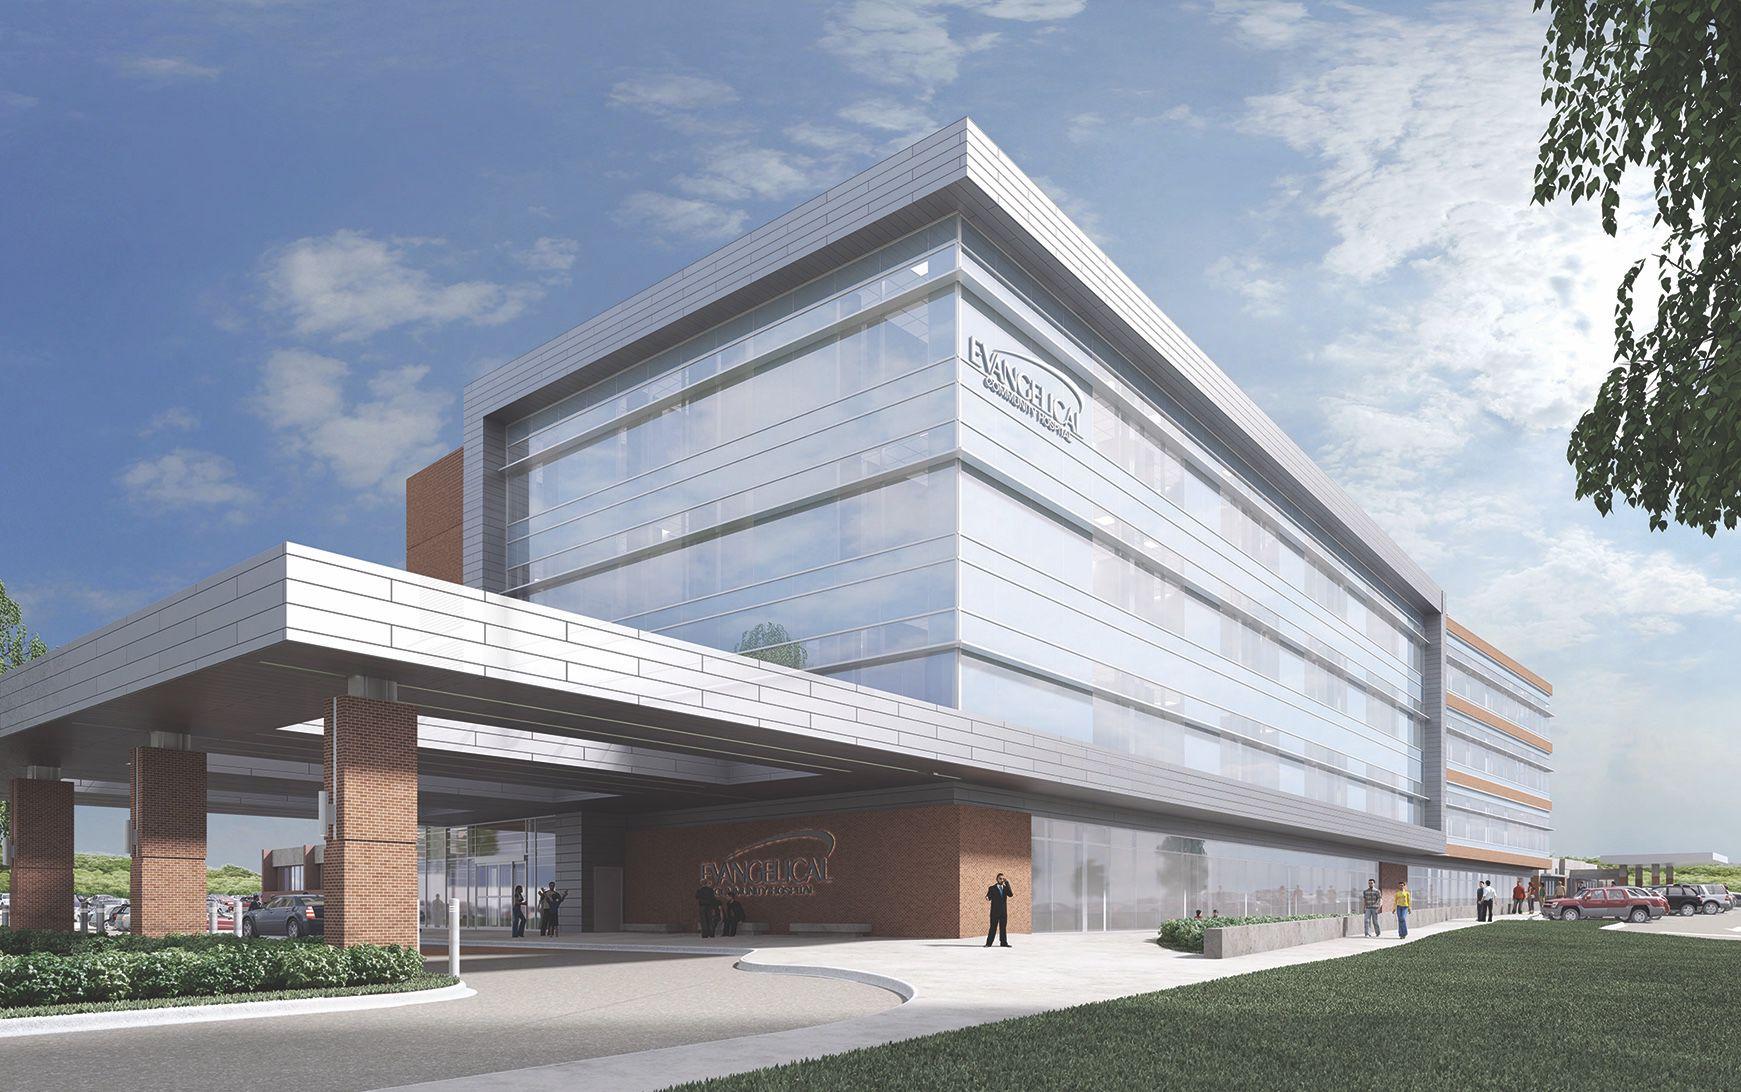 Evangelical expansion Evangelical Community Hospital announces 72